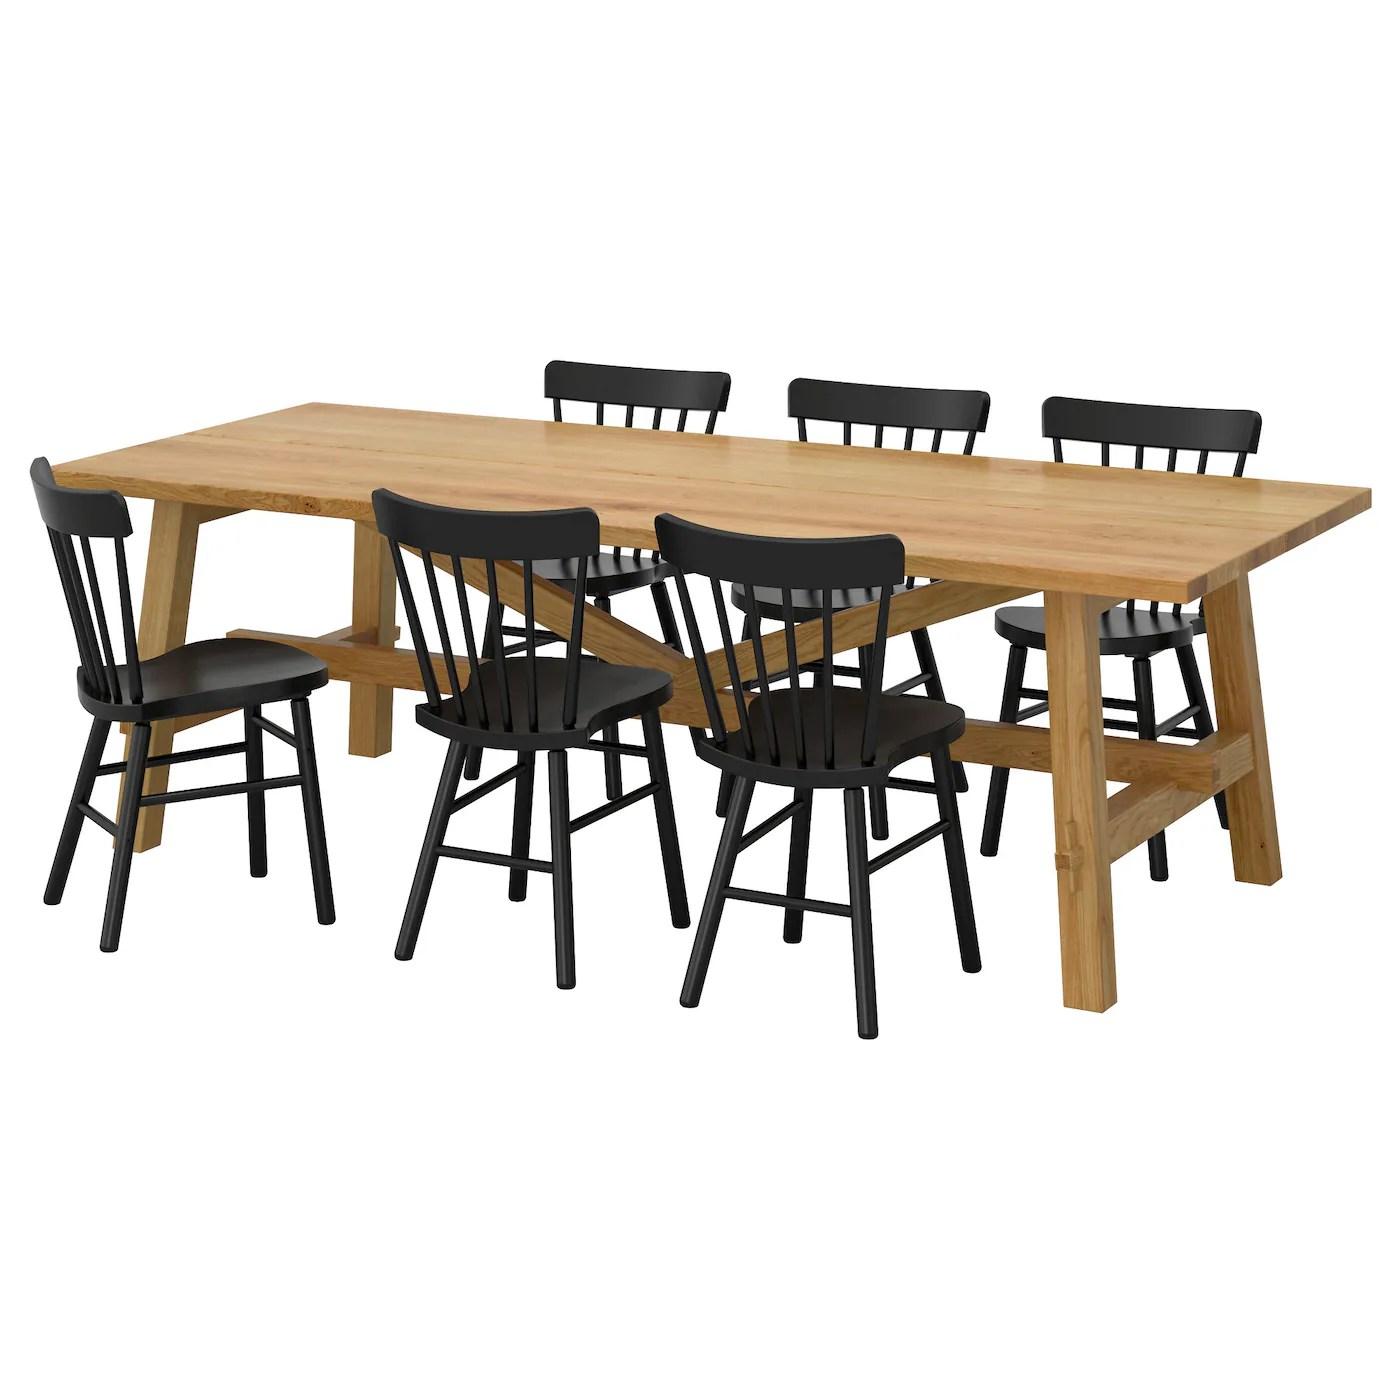 Eettafel Set 6 Personen.Eettafel 6 Stoelen Ikea Inklapbare Tafel Ikea Nieuw Bamboe Stoelen